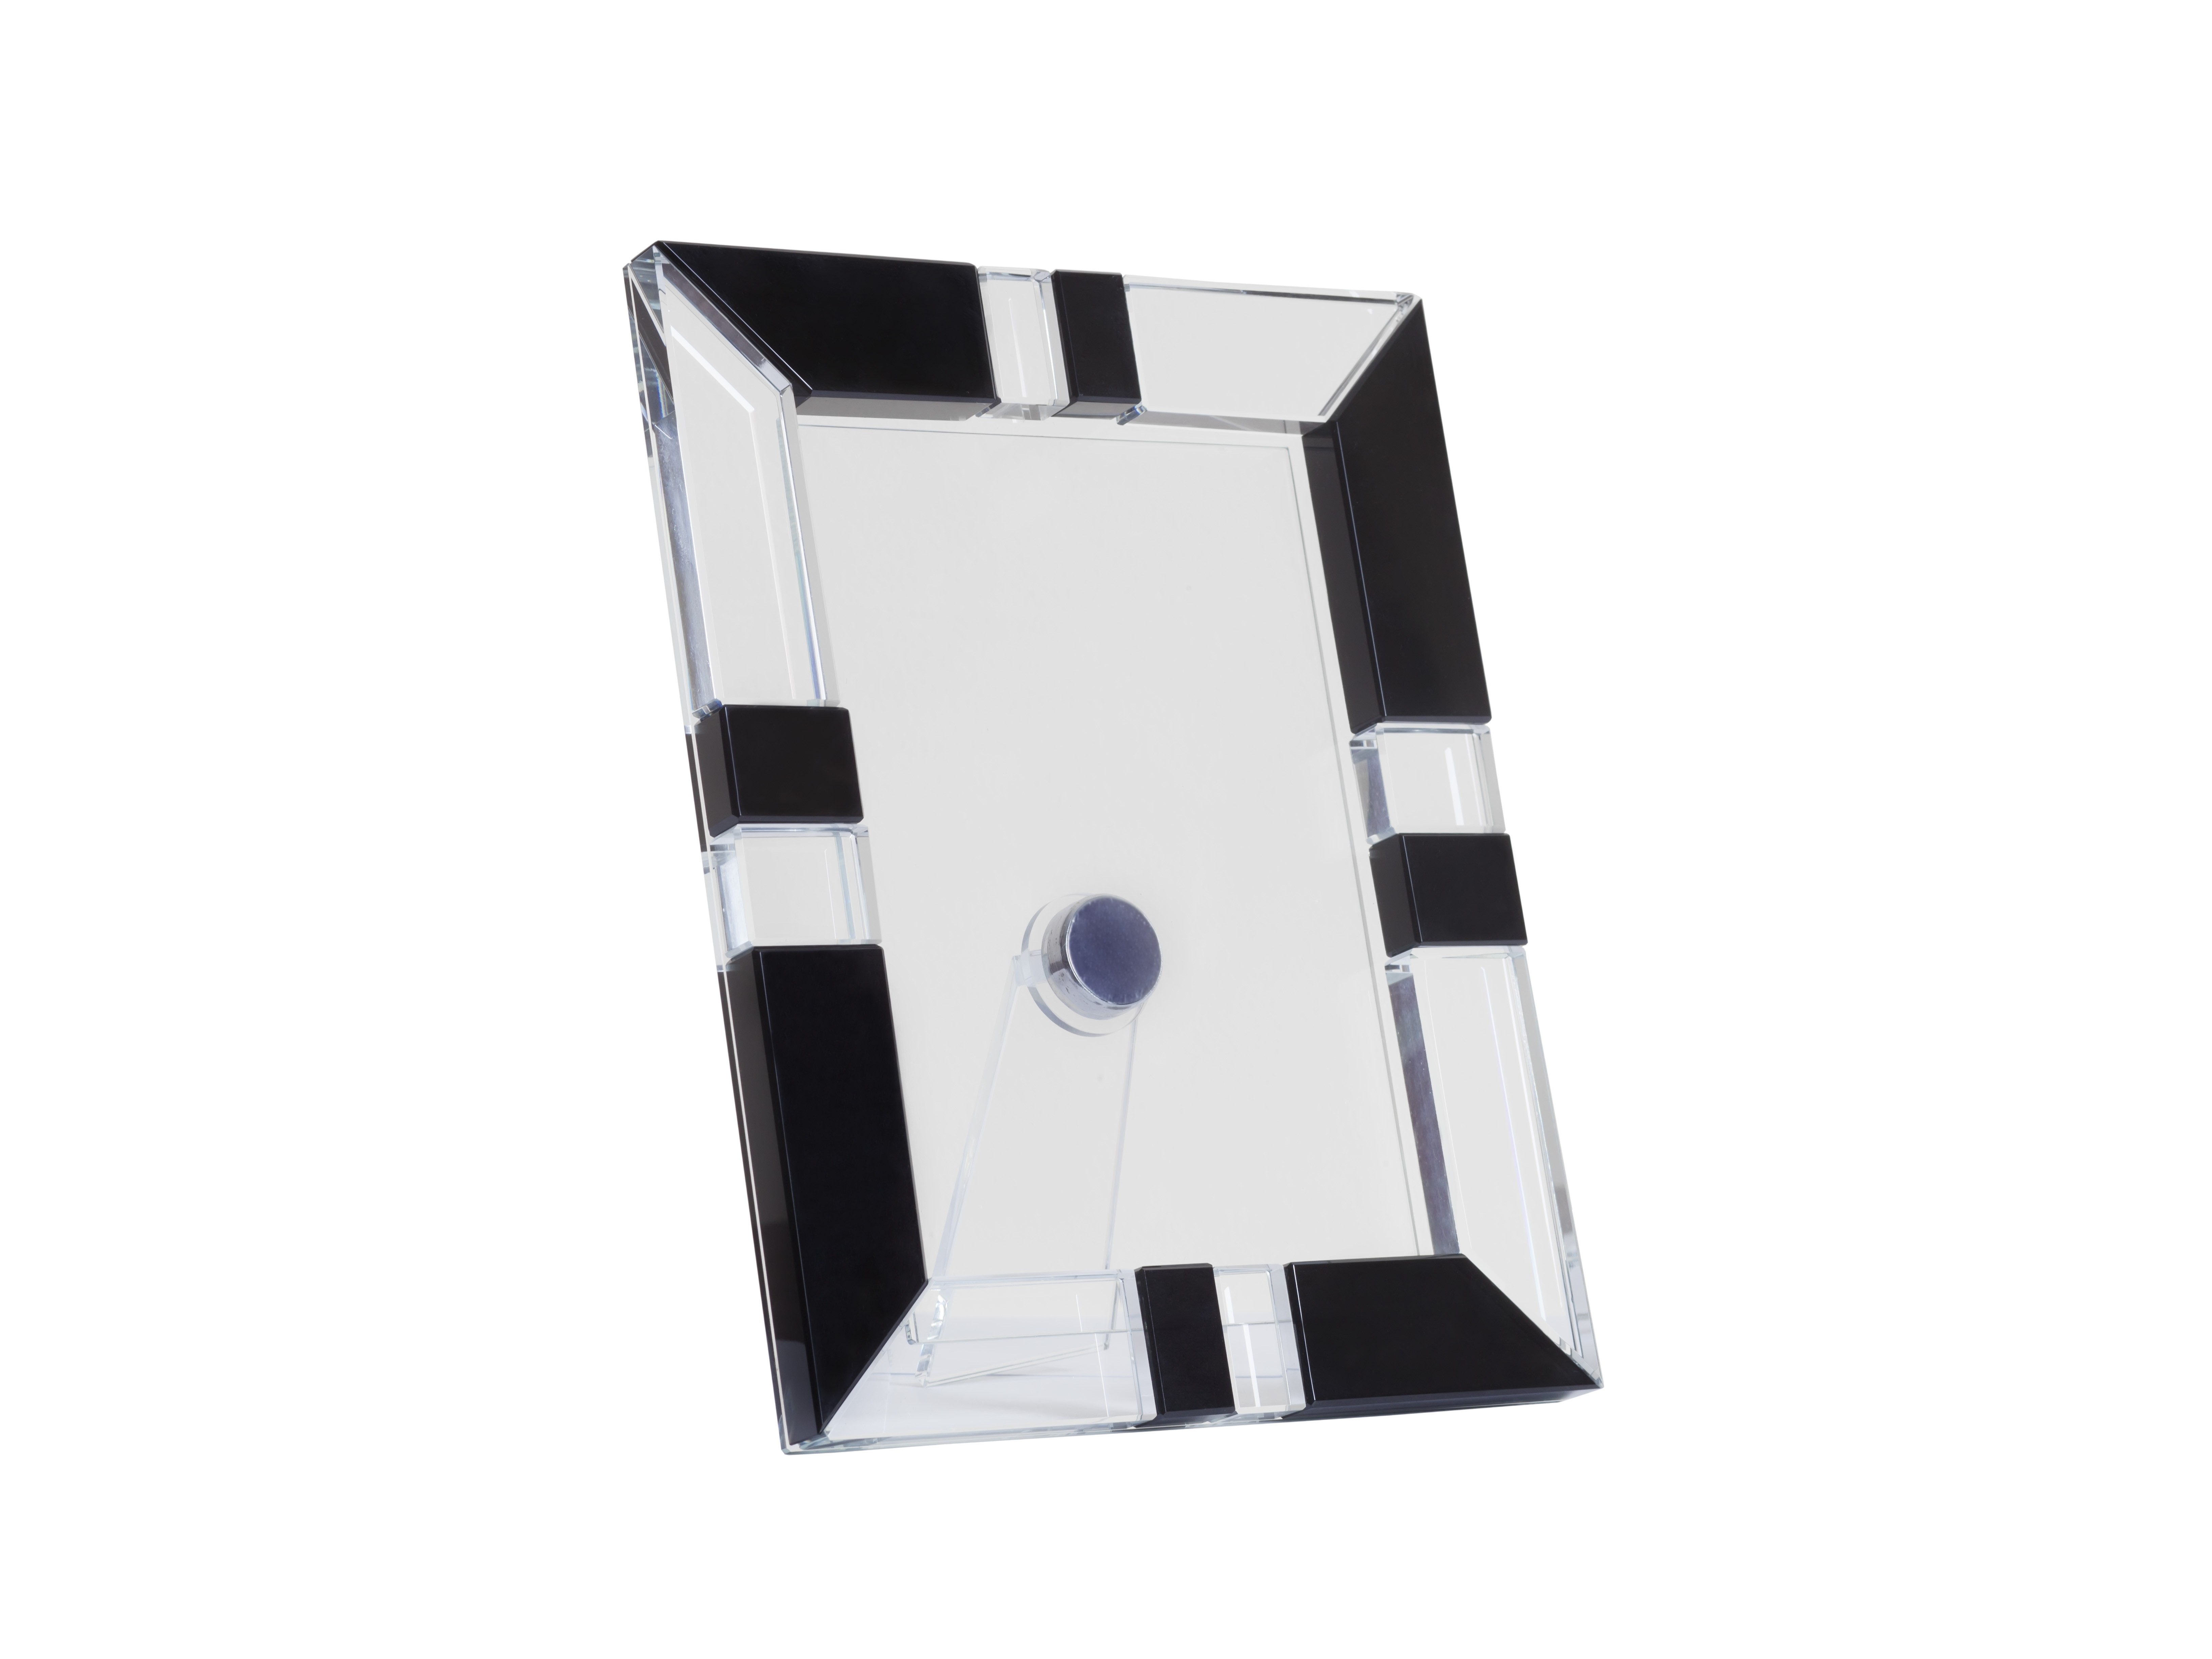 ФоторамкаРамки для фотографий<br><br><br>Material: Хрусталь<br>Width см: 15<br>Depth см: 10<br>Height см: 20